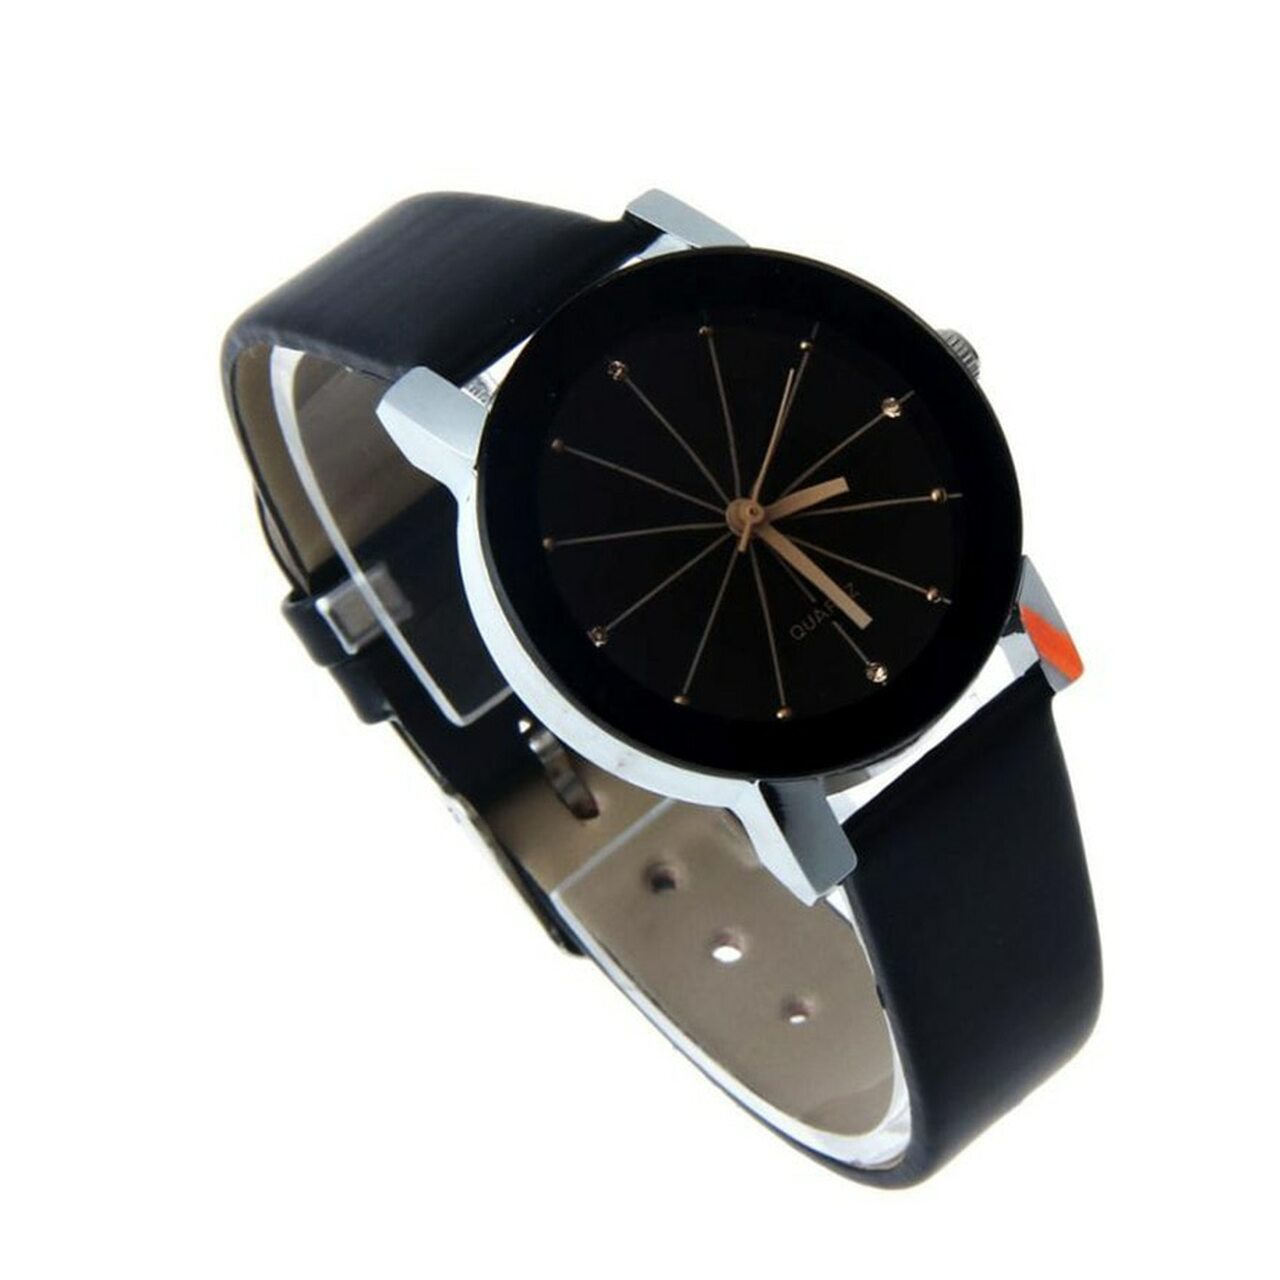 5de103b84 ... Hot 2018 New Fashion Watches Women Men Lovers Watch Leather Quartz  Wristwatch Female Male Clocks Relogio ...